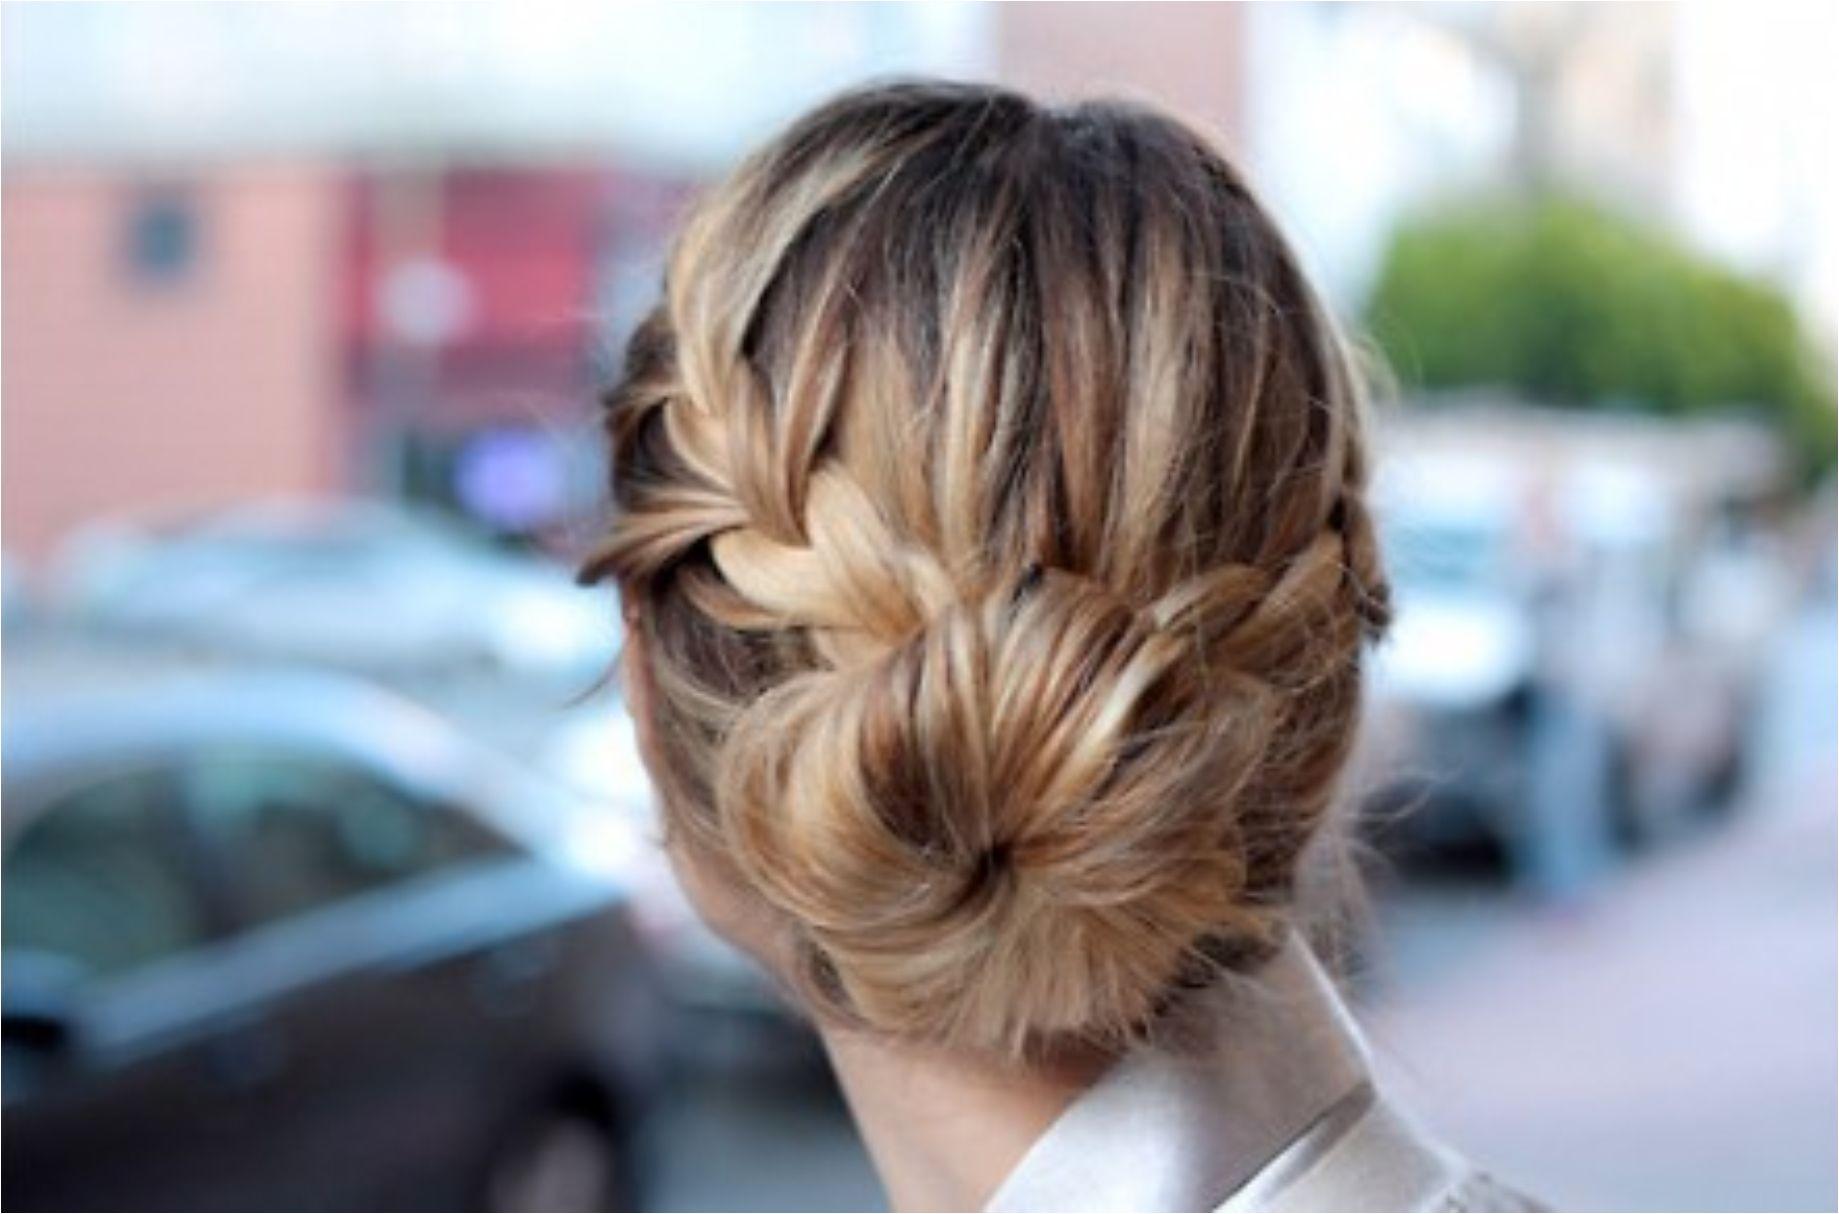 sock-bun-office-hairstyles-for-women-1